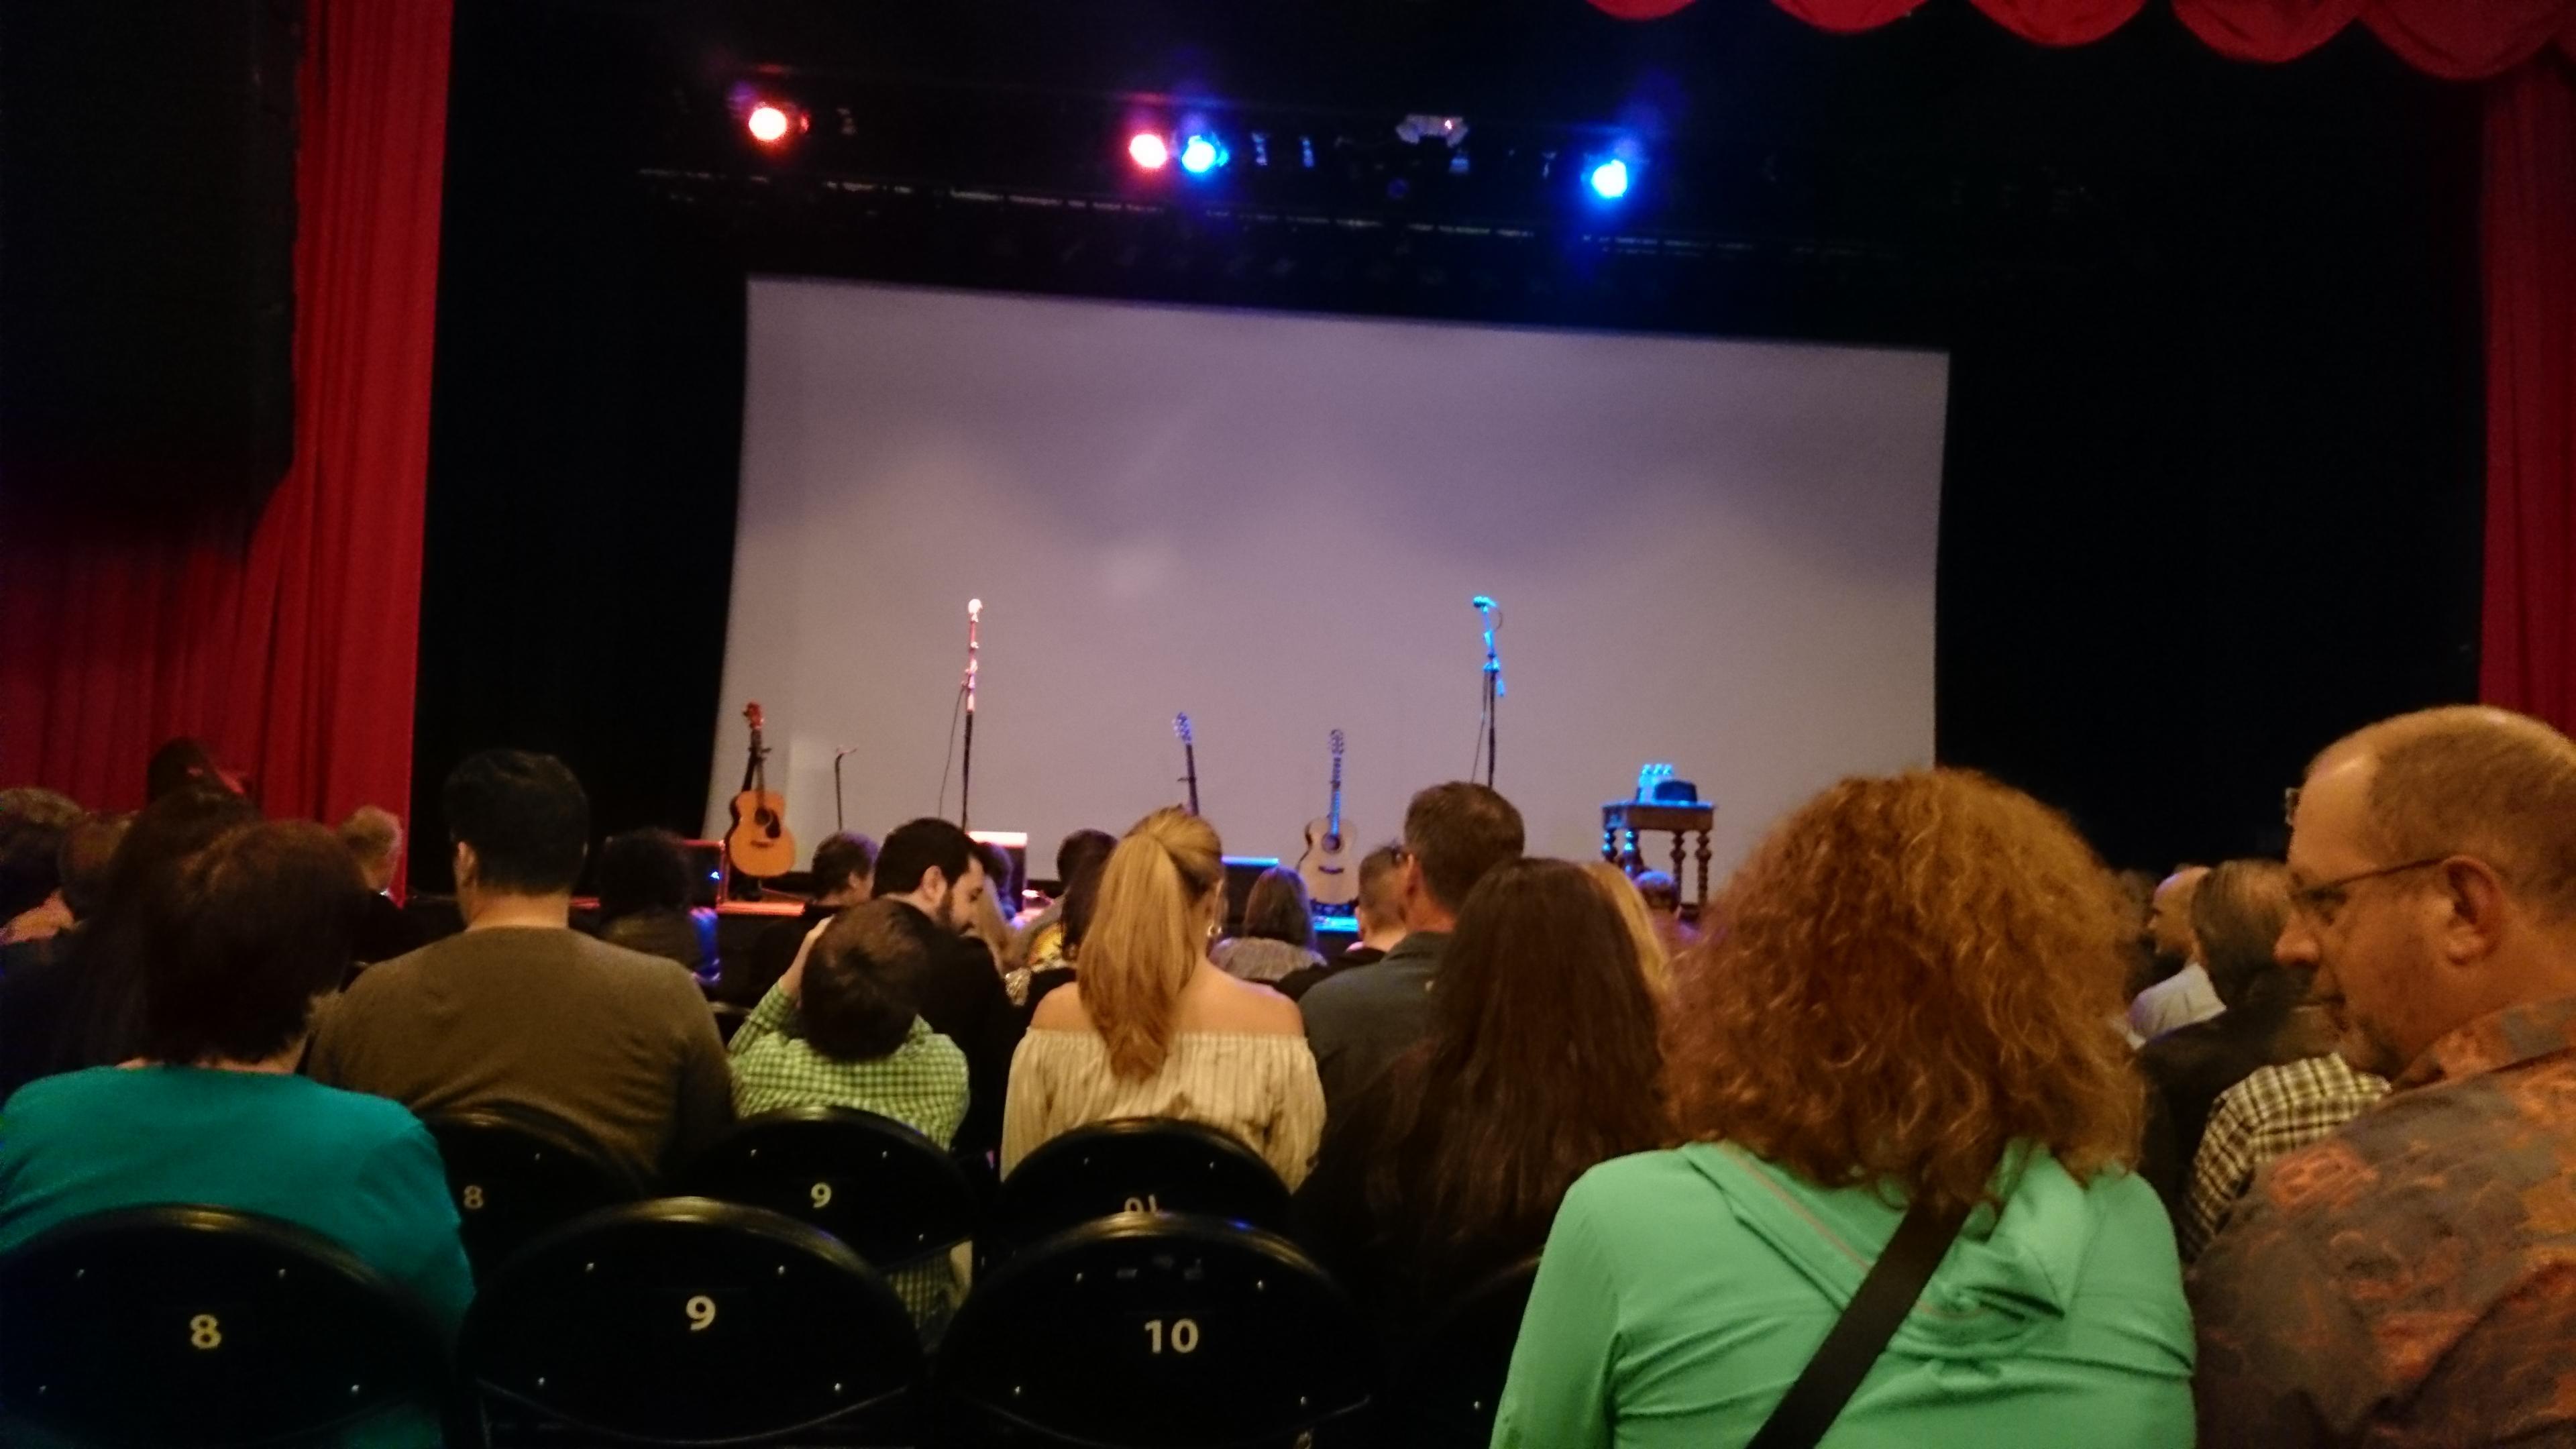 Ponte Vedra Concert Hall Row J Seat 10